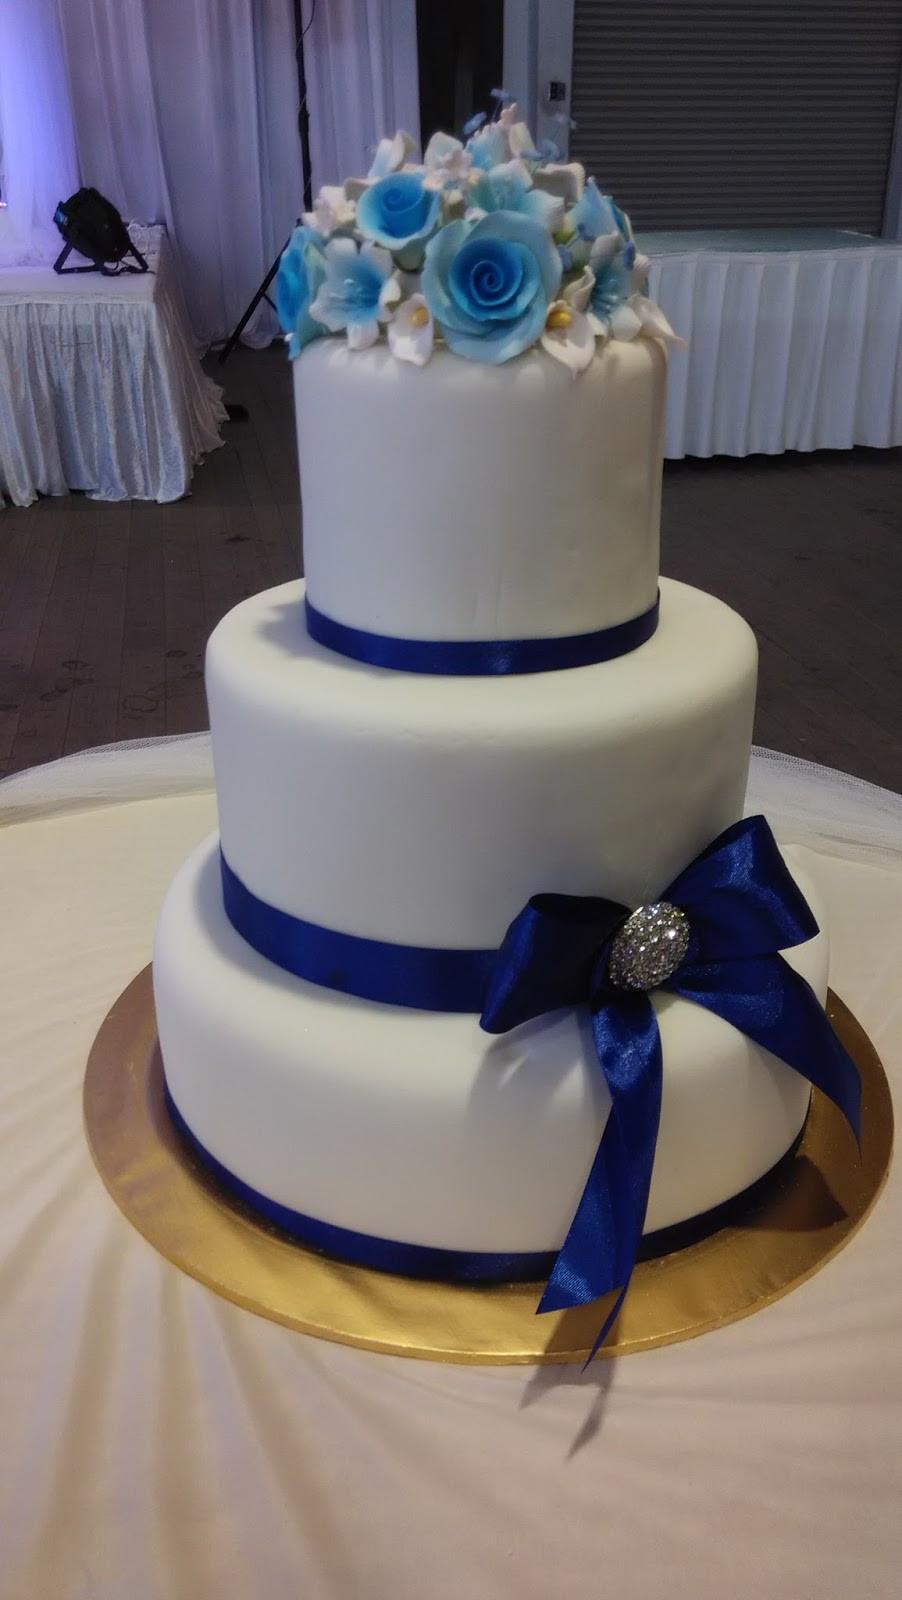 Themed Wedding Cakes  jujucupcakes Royal Blue and Purple themed wedding cakes